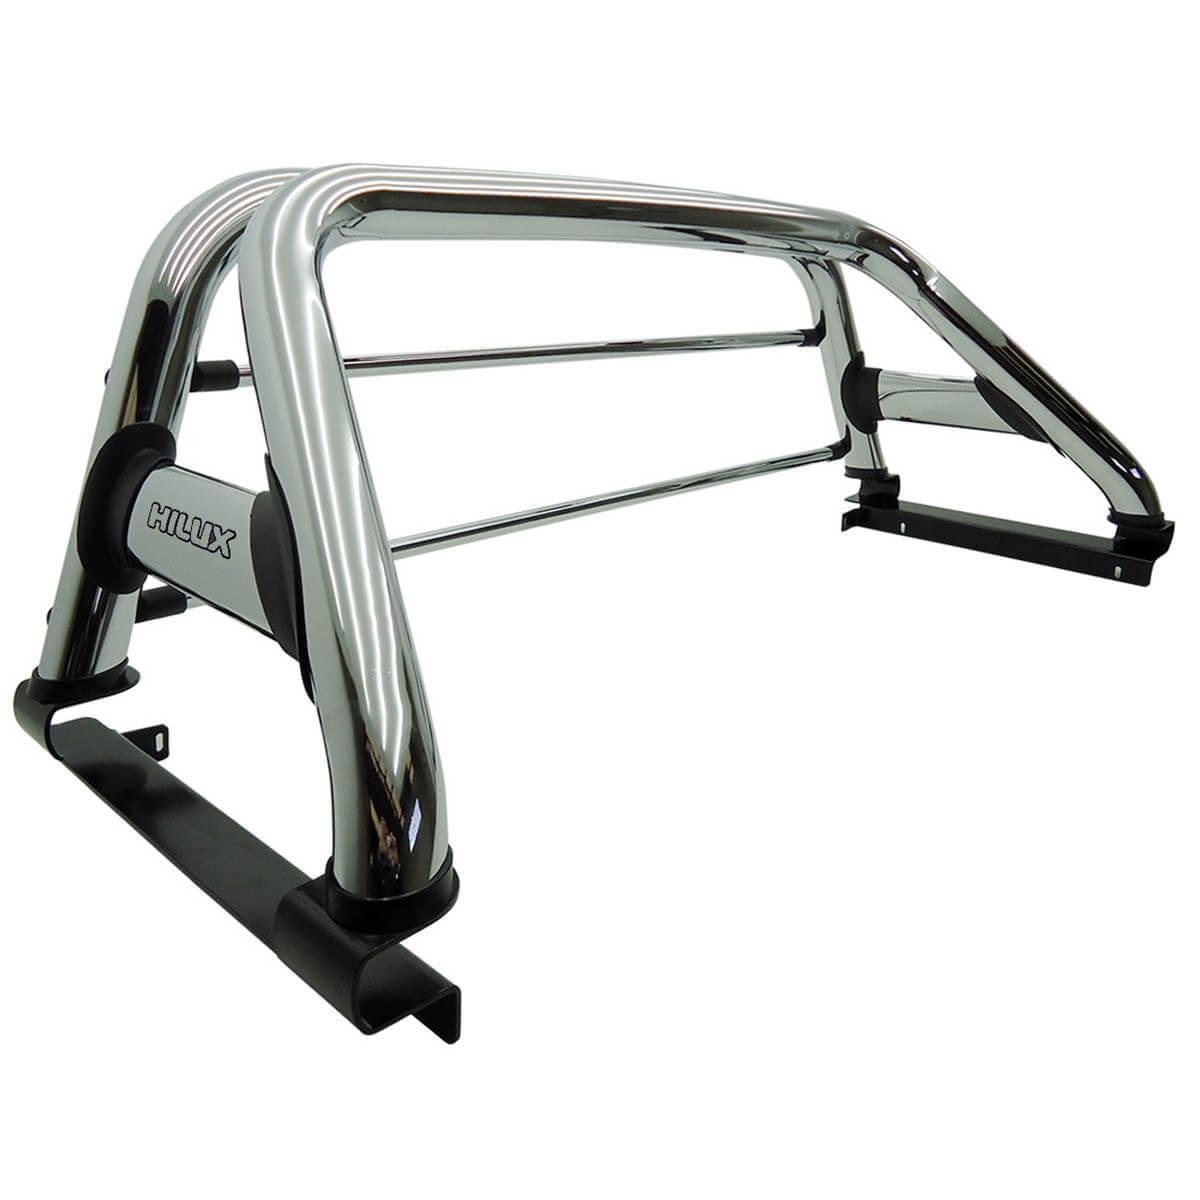 Santo antônio Track duplo cromado Hilux 2005 a 2015 com barras de vidro inox